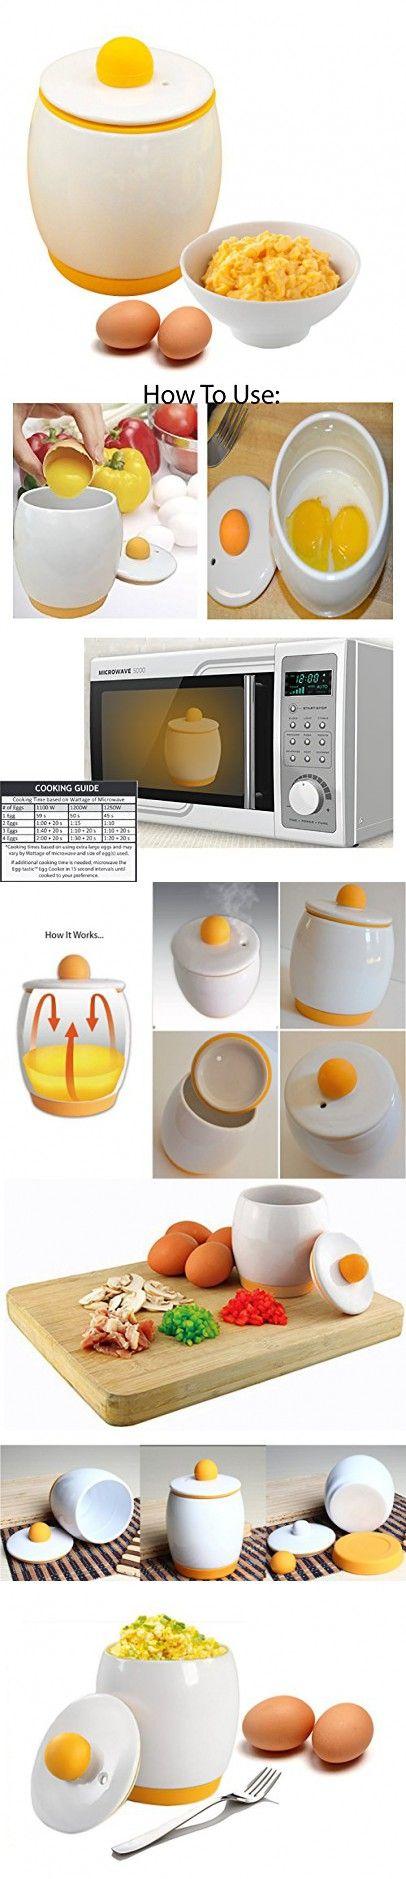 Ceramic Microwave Egg Cooker / Microwave Egg Poacher / Instant Scrambled Egg Cooker / Microwave Egg Cooker (Ceramic/Silicone)